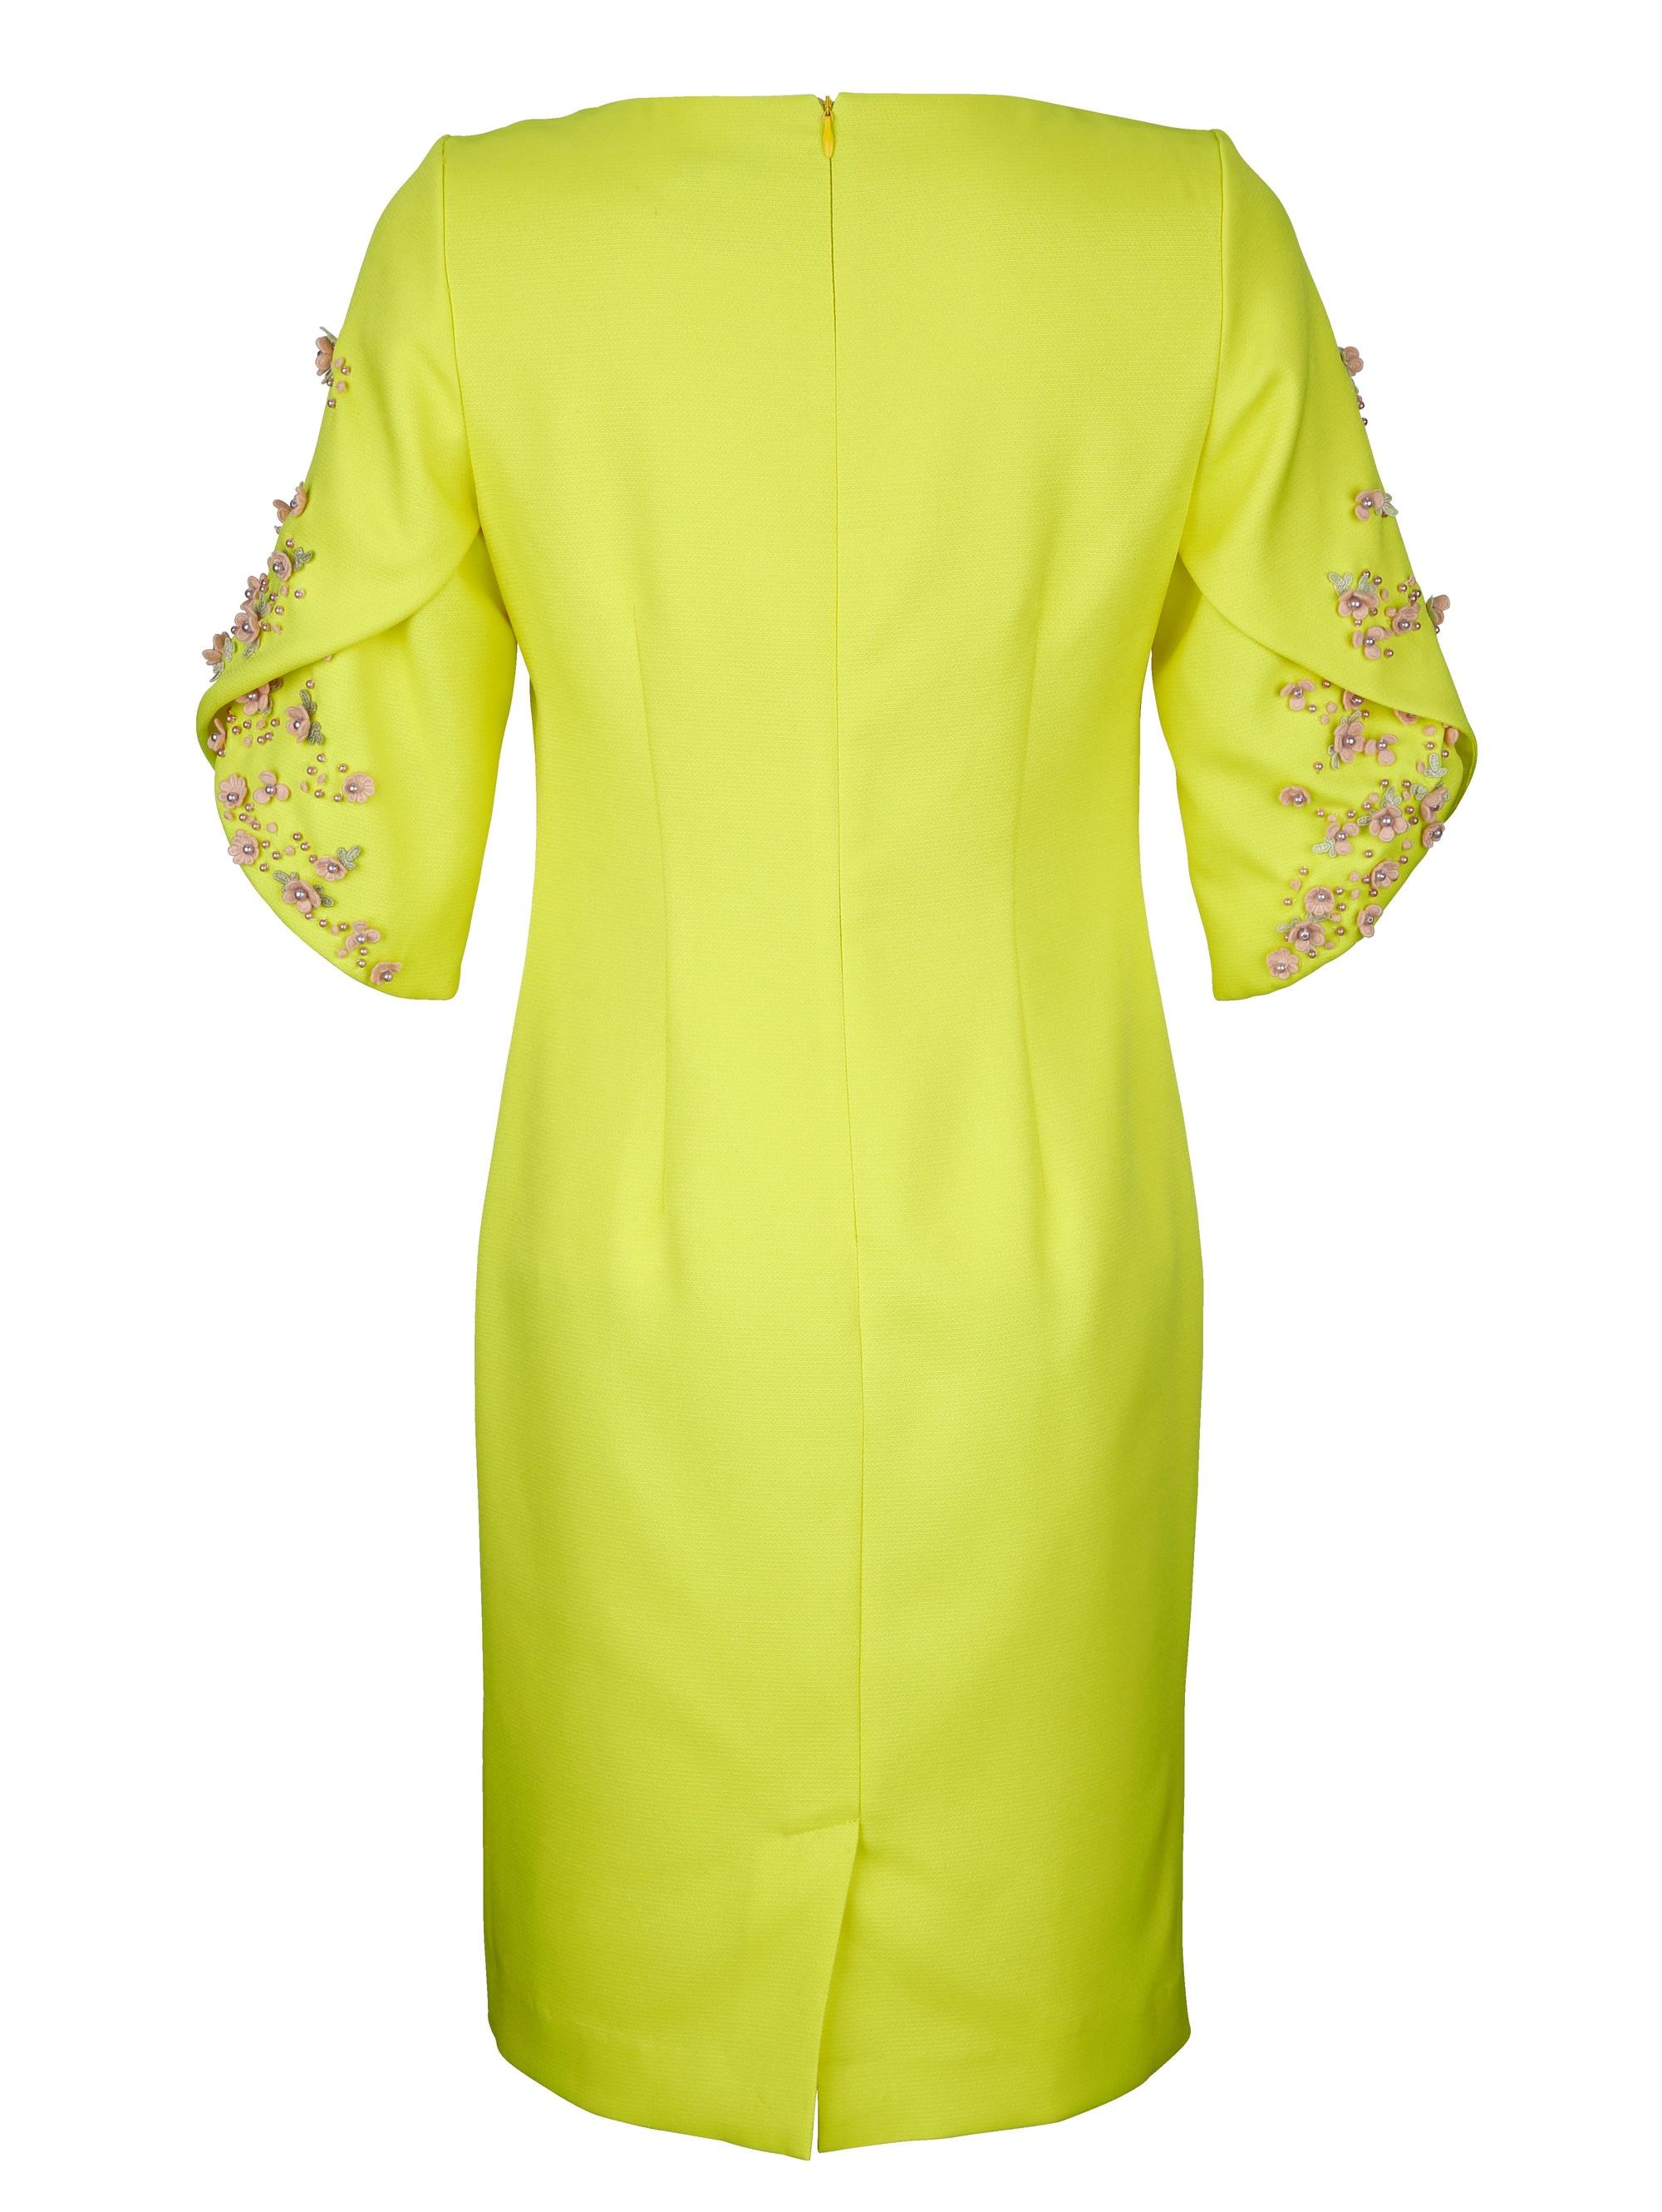 Alba Moda Kleid mit edlen Blüten-Applikationen